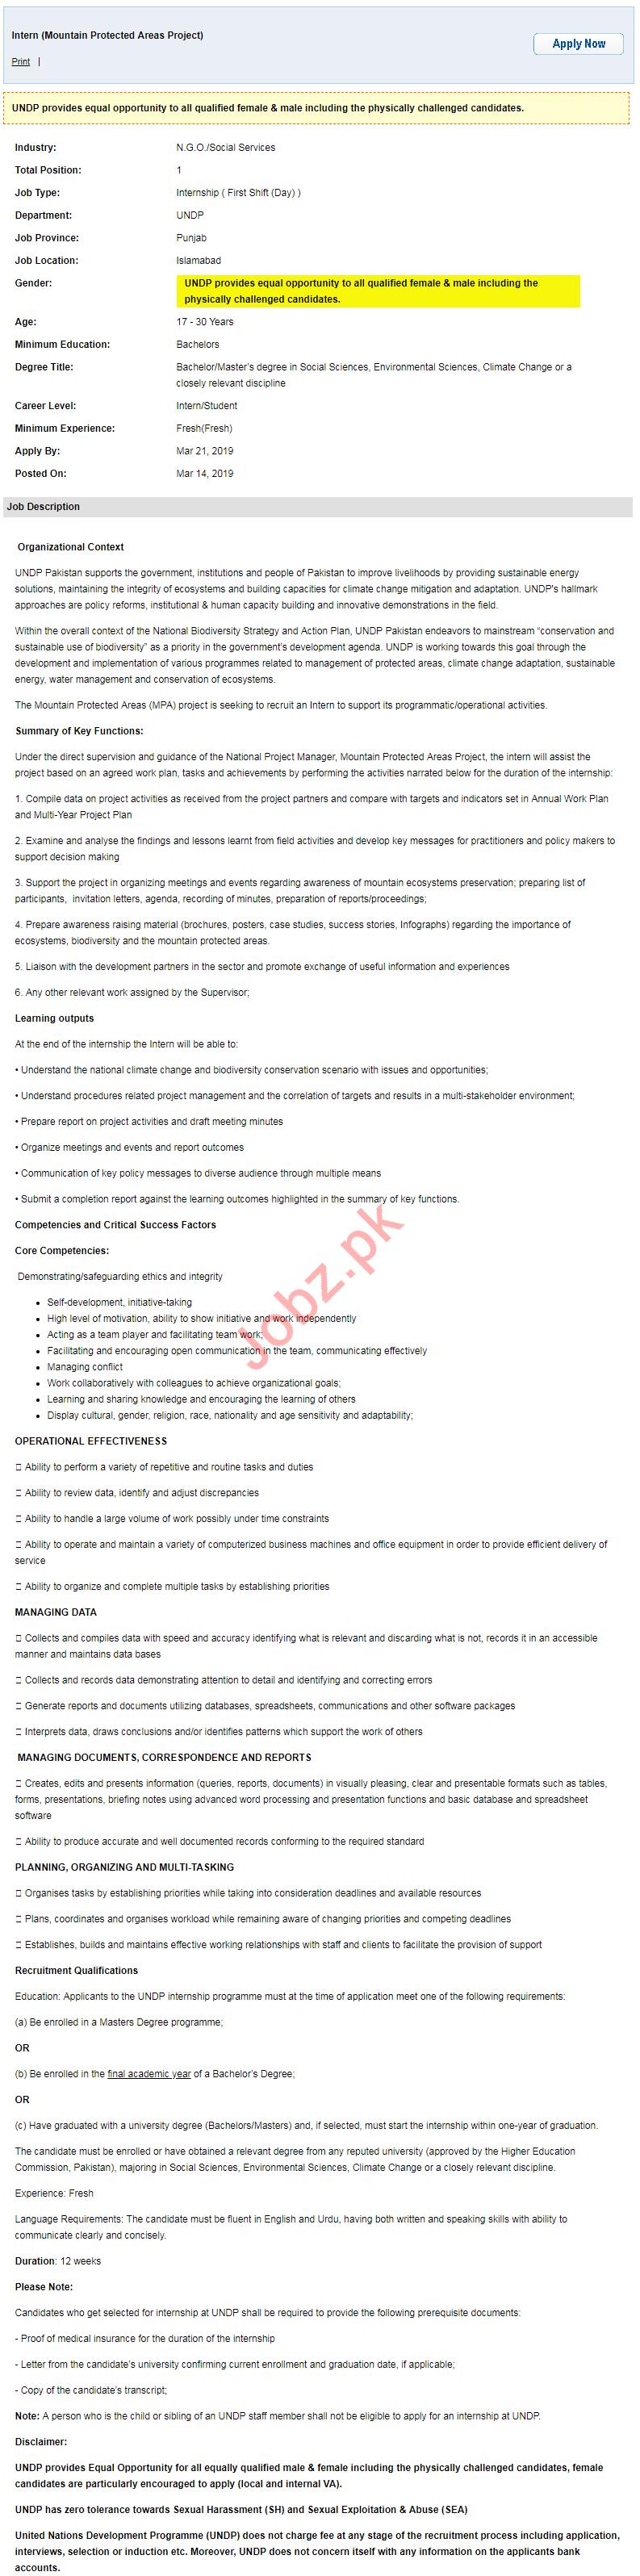 undp united nations development programme ngo job 2019 job